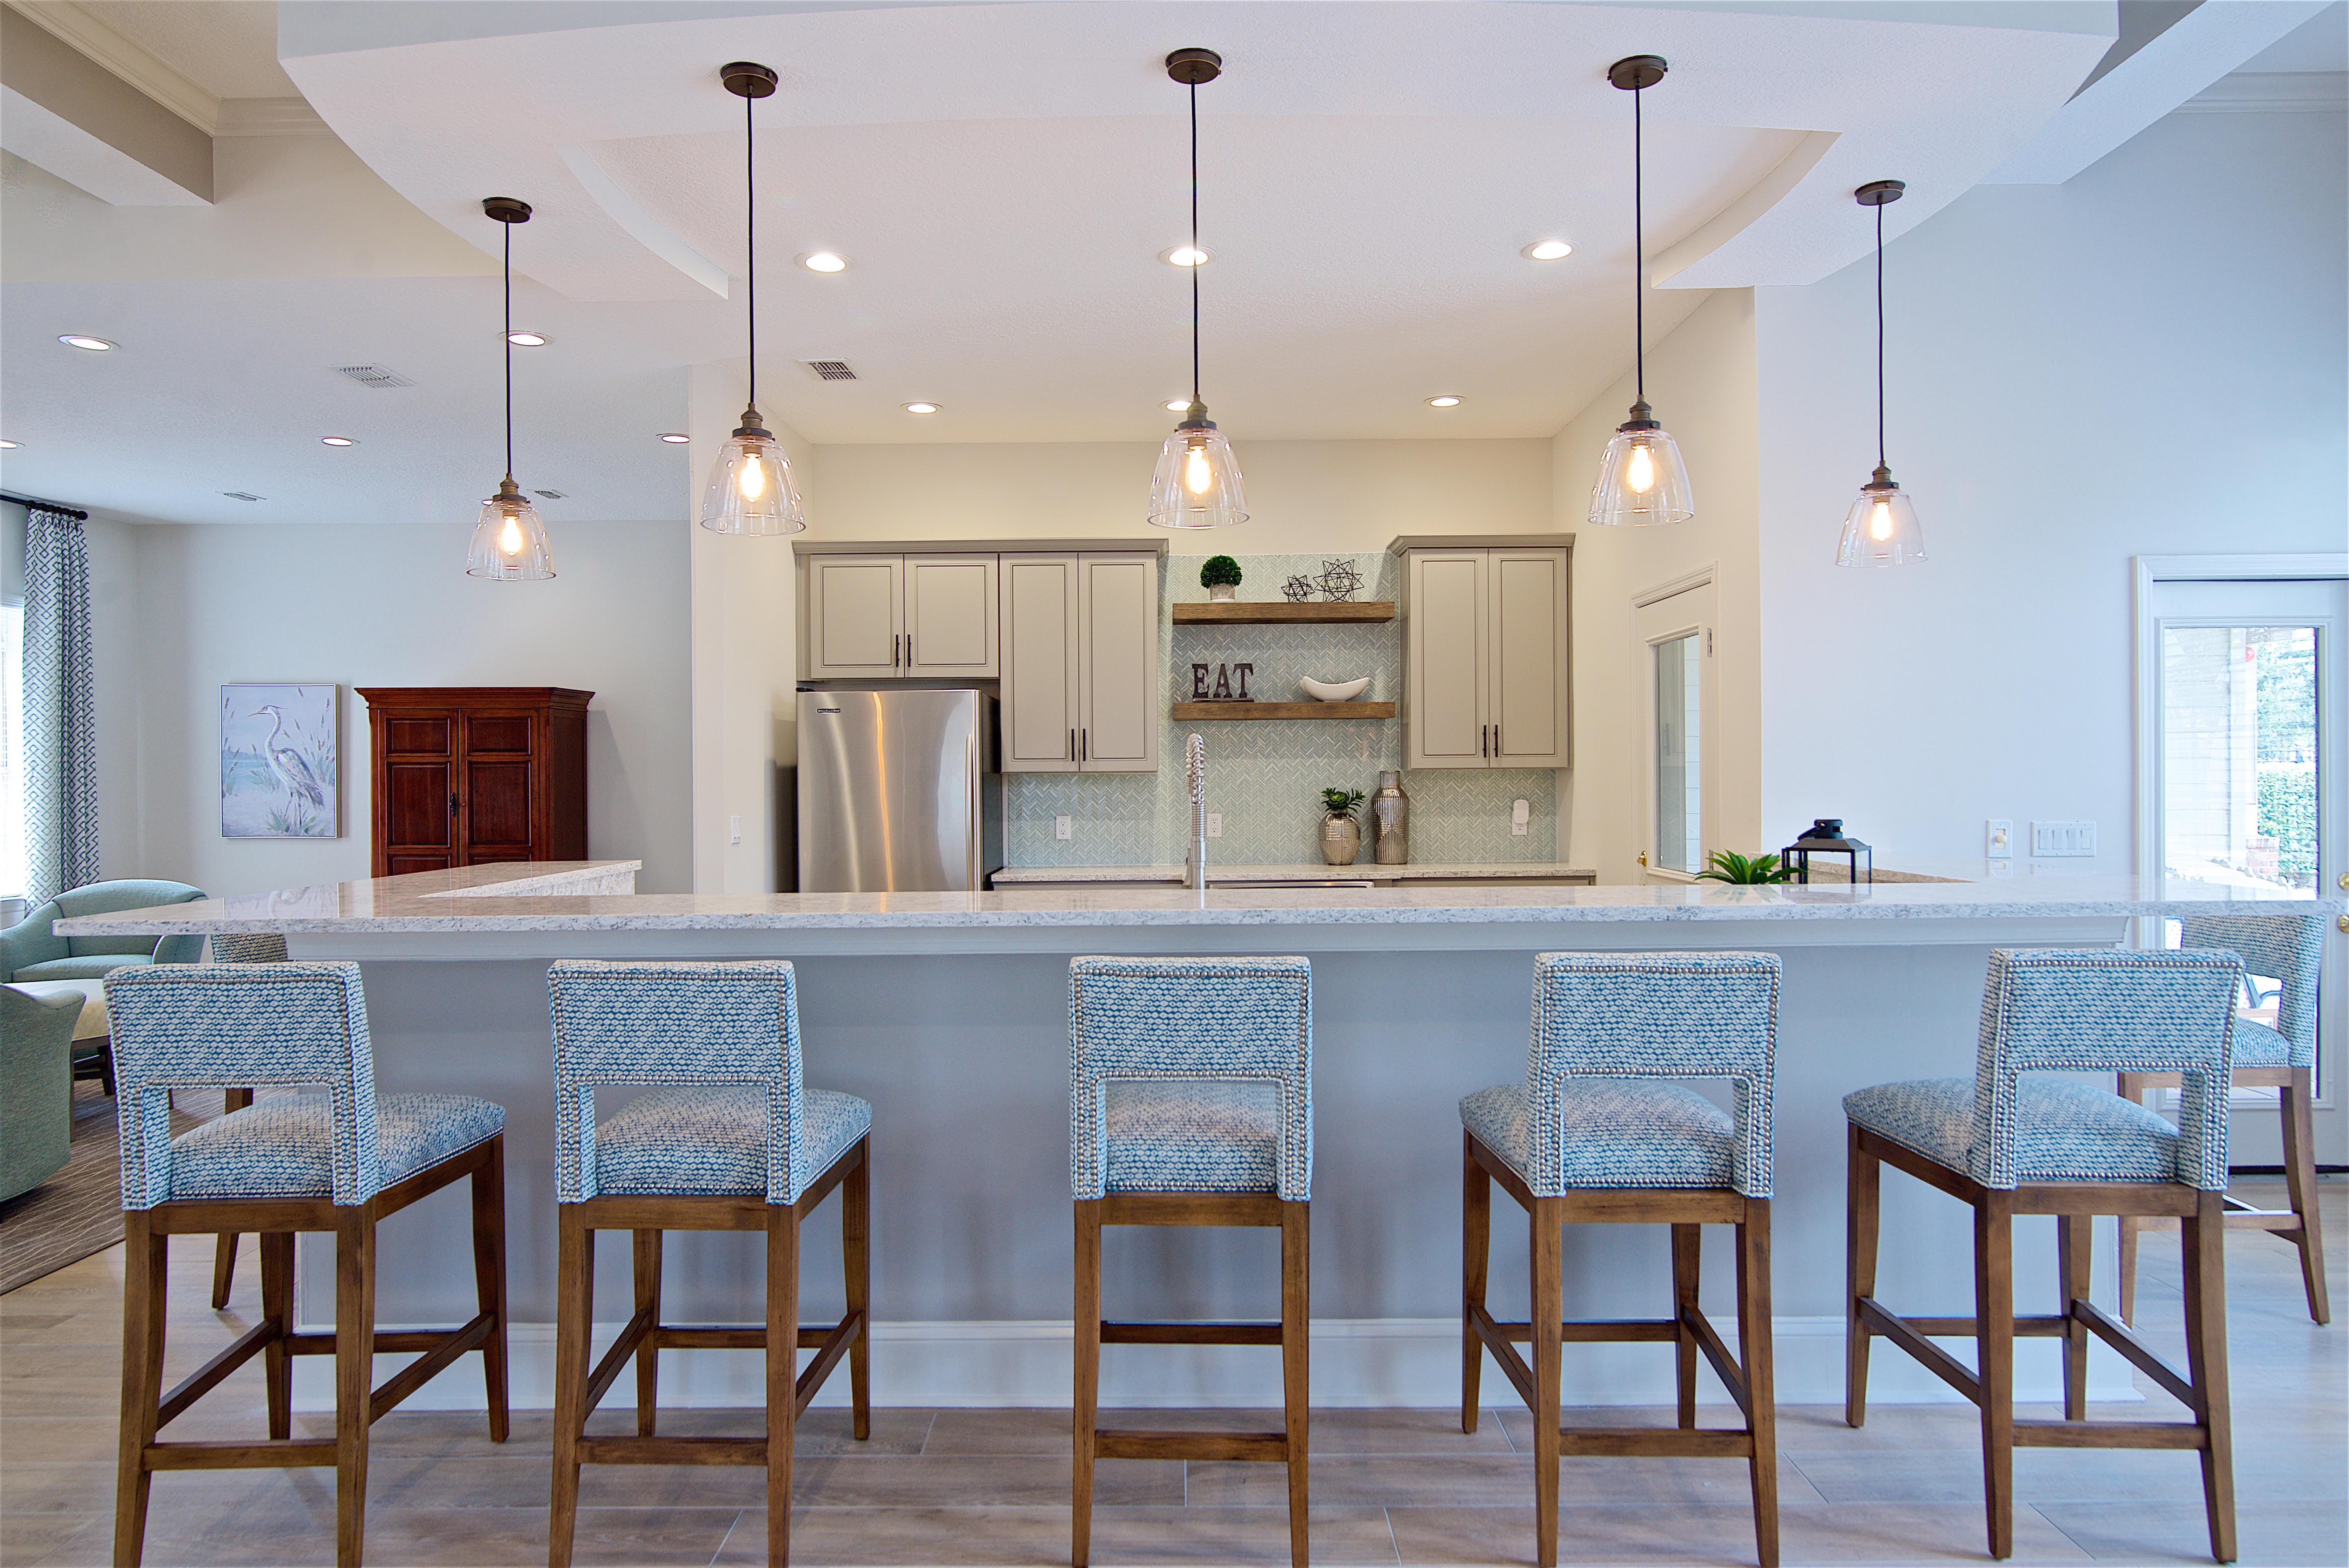 Shirley-Kishek-Interiors-Jacksonville-Florida-Interior-Decorating-Clubhouse-Revival-10